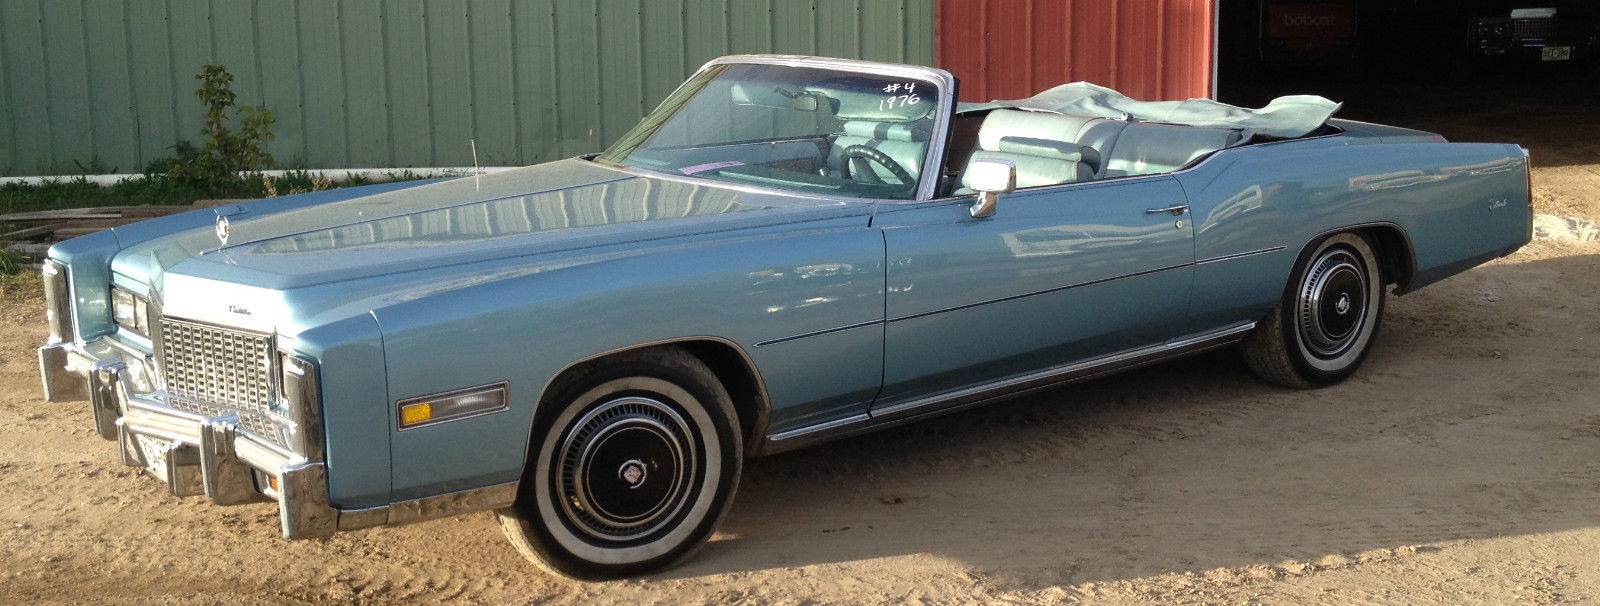 1976 cadillac eldorado convertible 2 door 8 2l blue with blue leather 89 706 classic cadillac. Black Bedroom Furniture Sets. Home Design Ideas